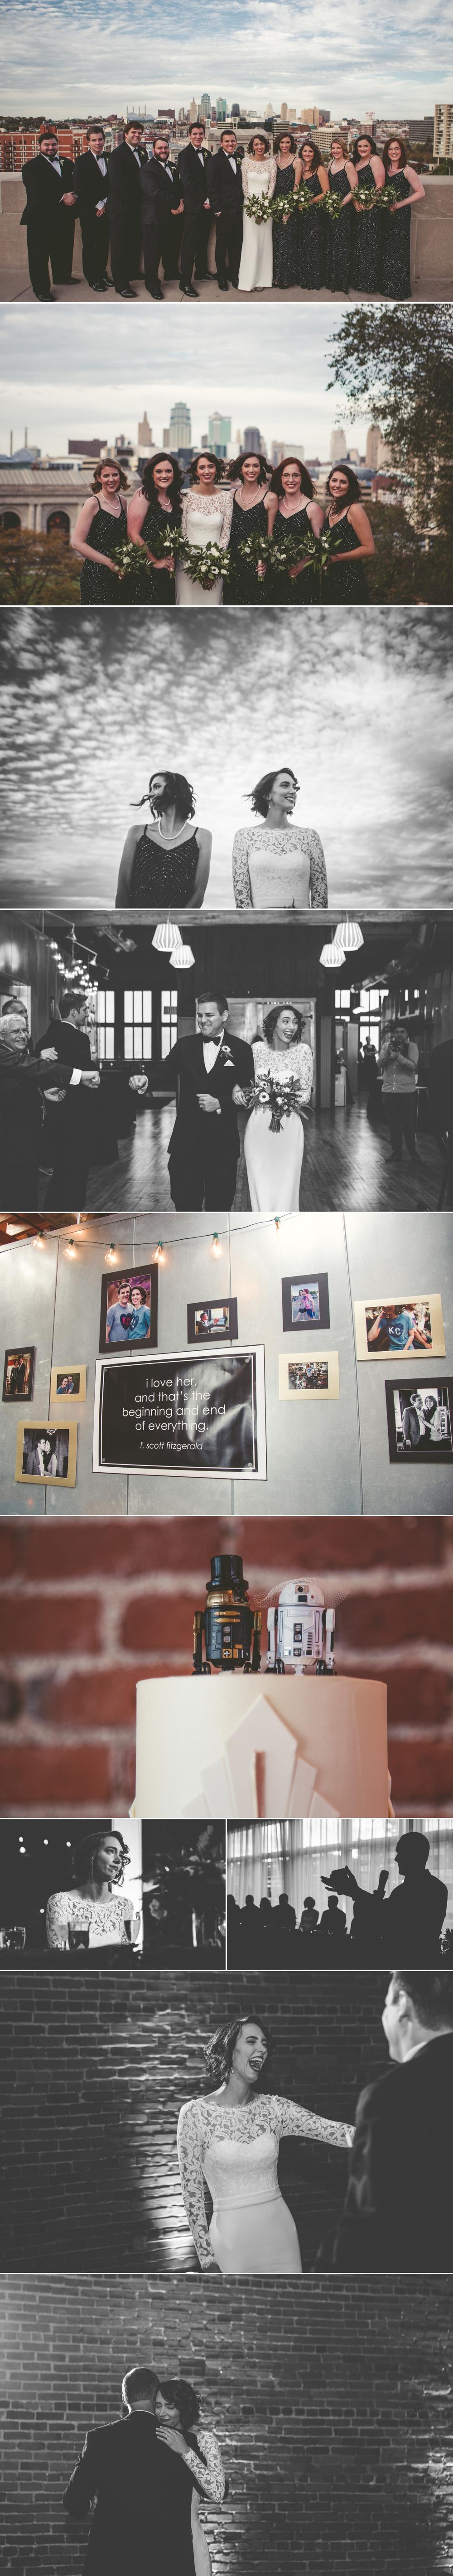 jason_domingues_photography_best_kansas_city_wedding_photographer_kc_weddings_berg0003